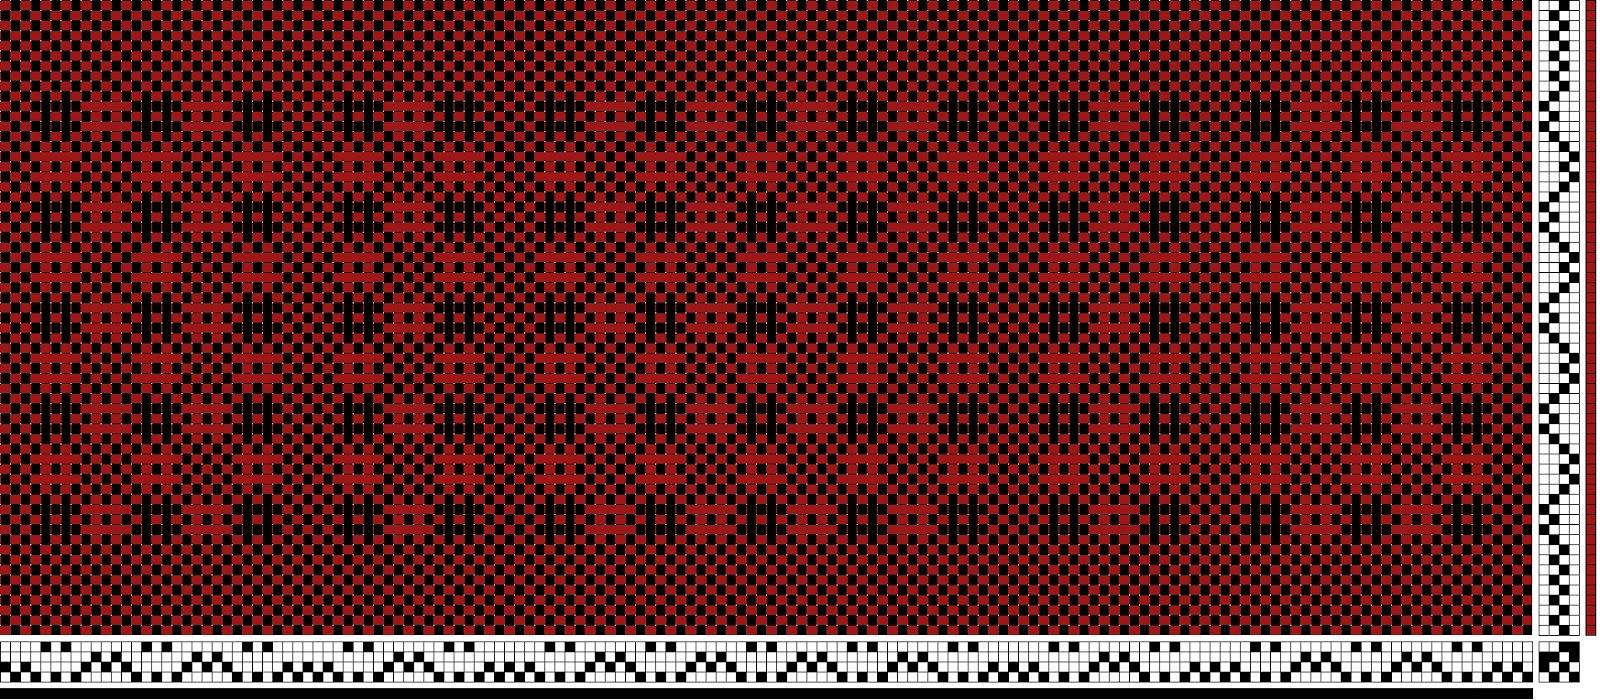 rysunek tkacki / weaving draft